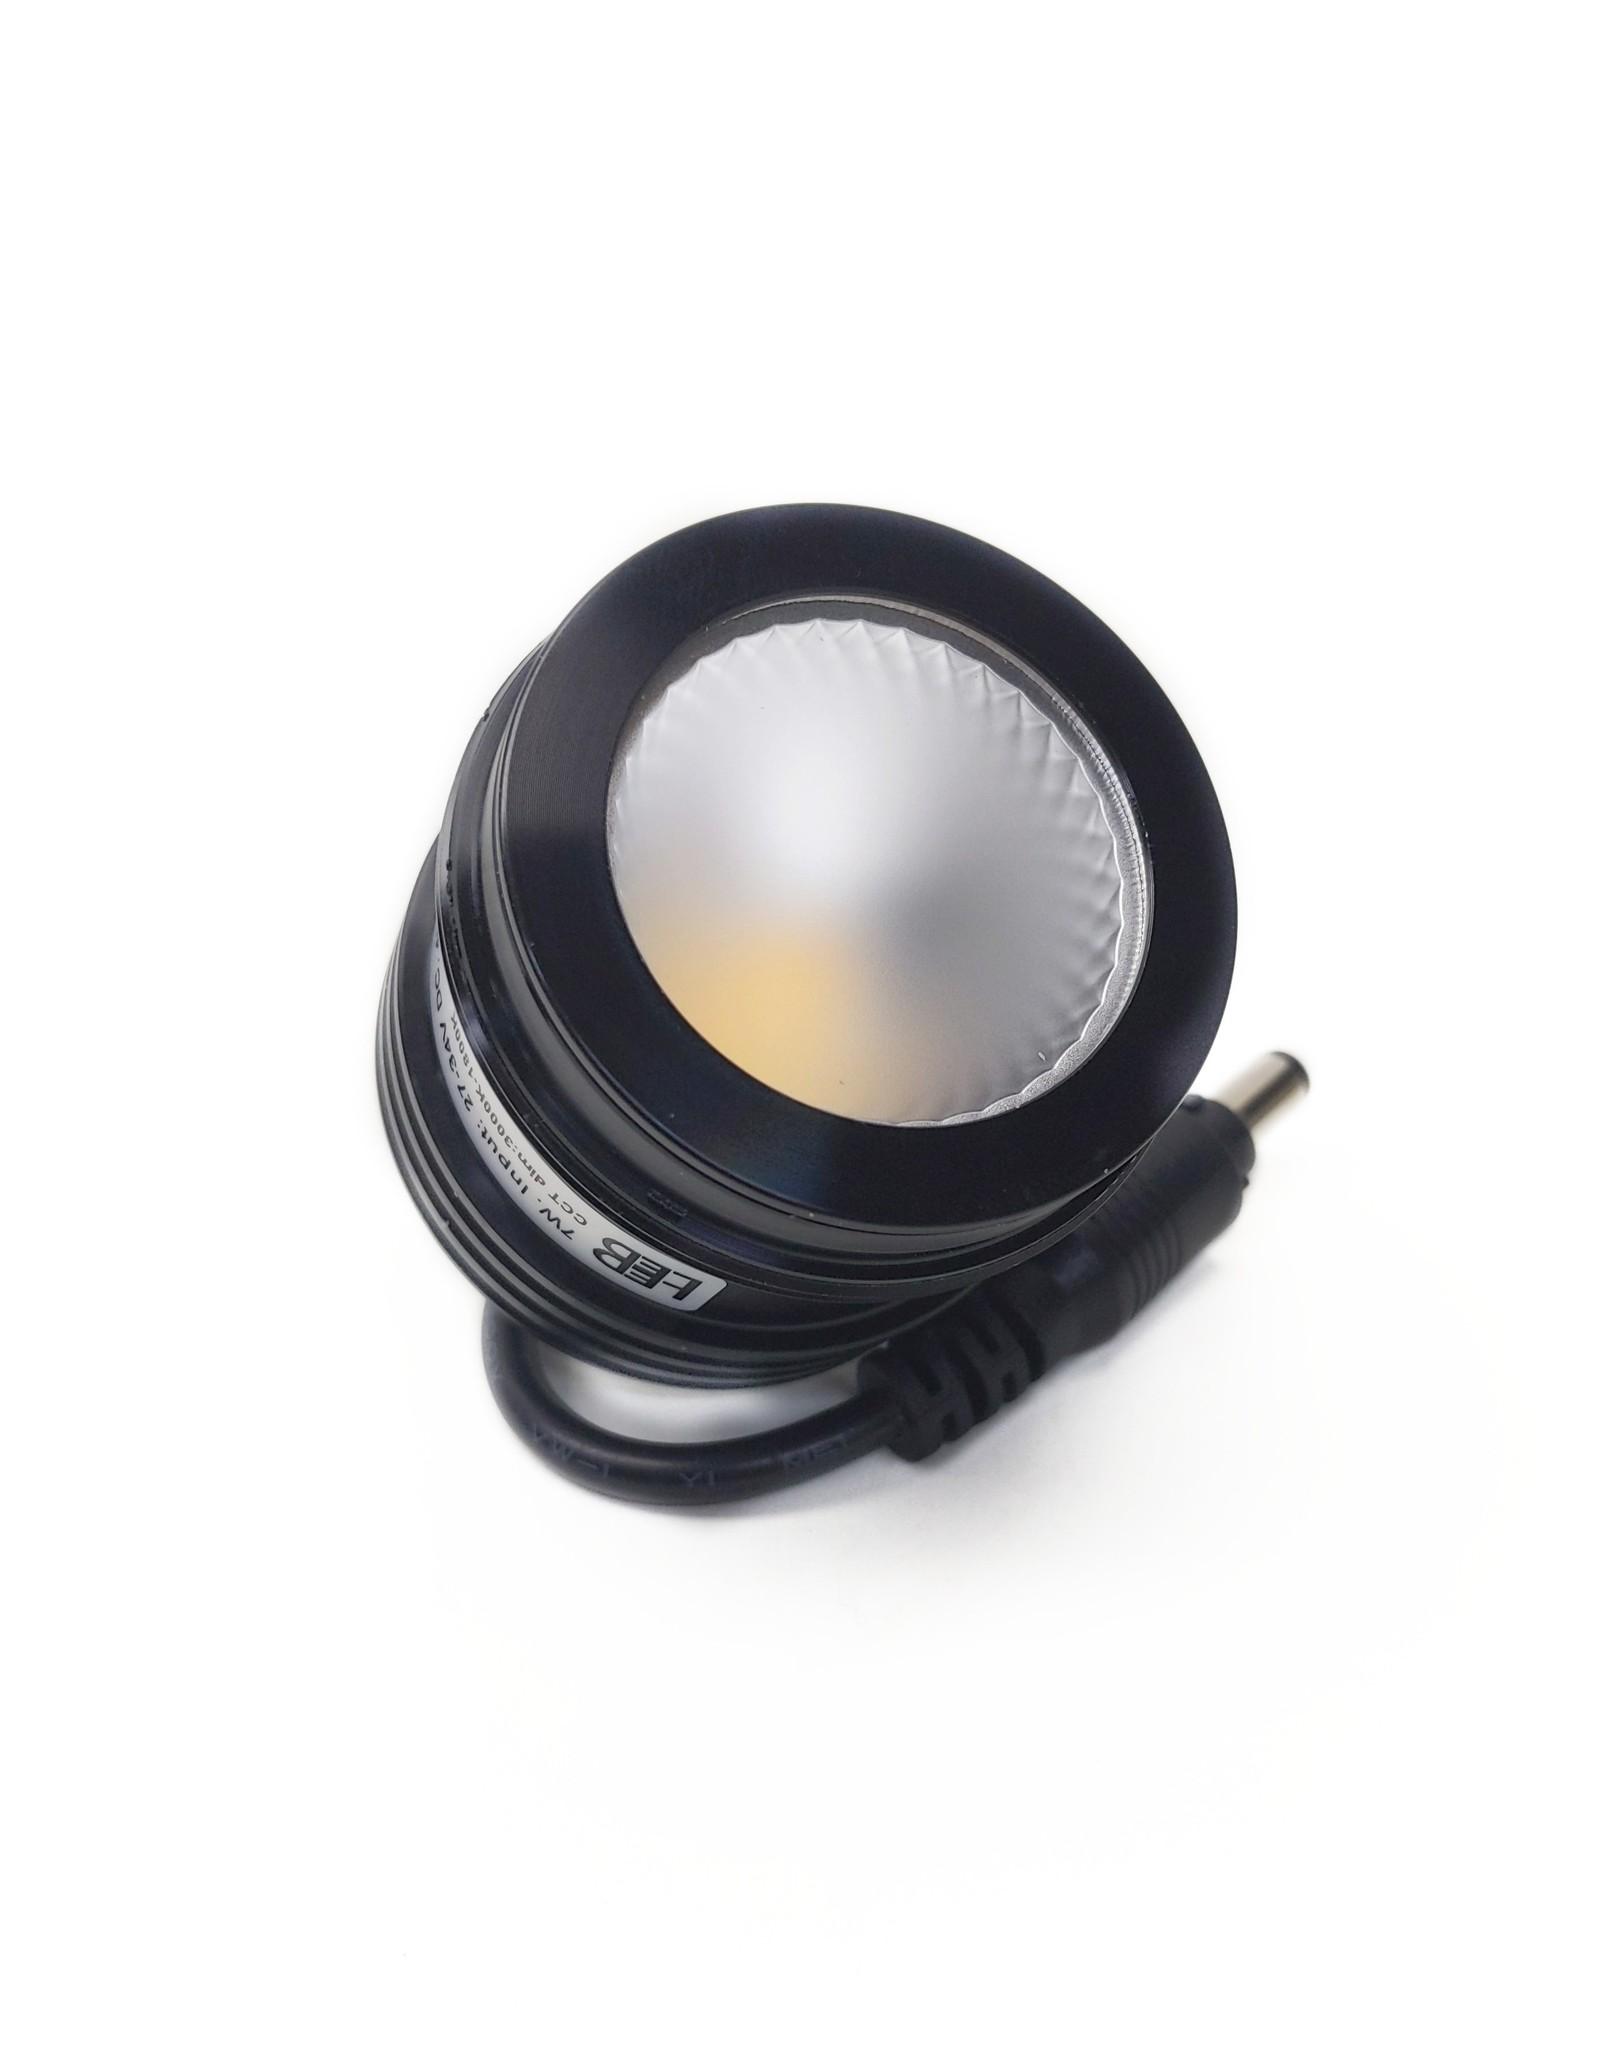 LedLed ADDY led kantelspot vierkant goud dimbaar - Pro reflector